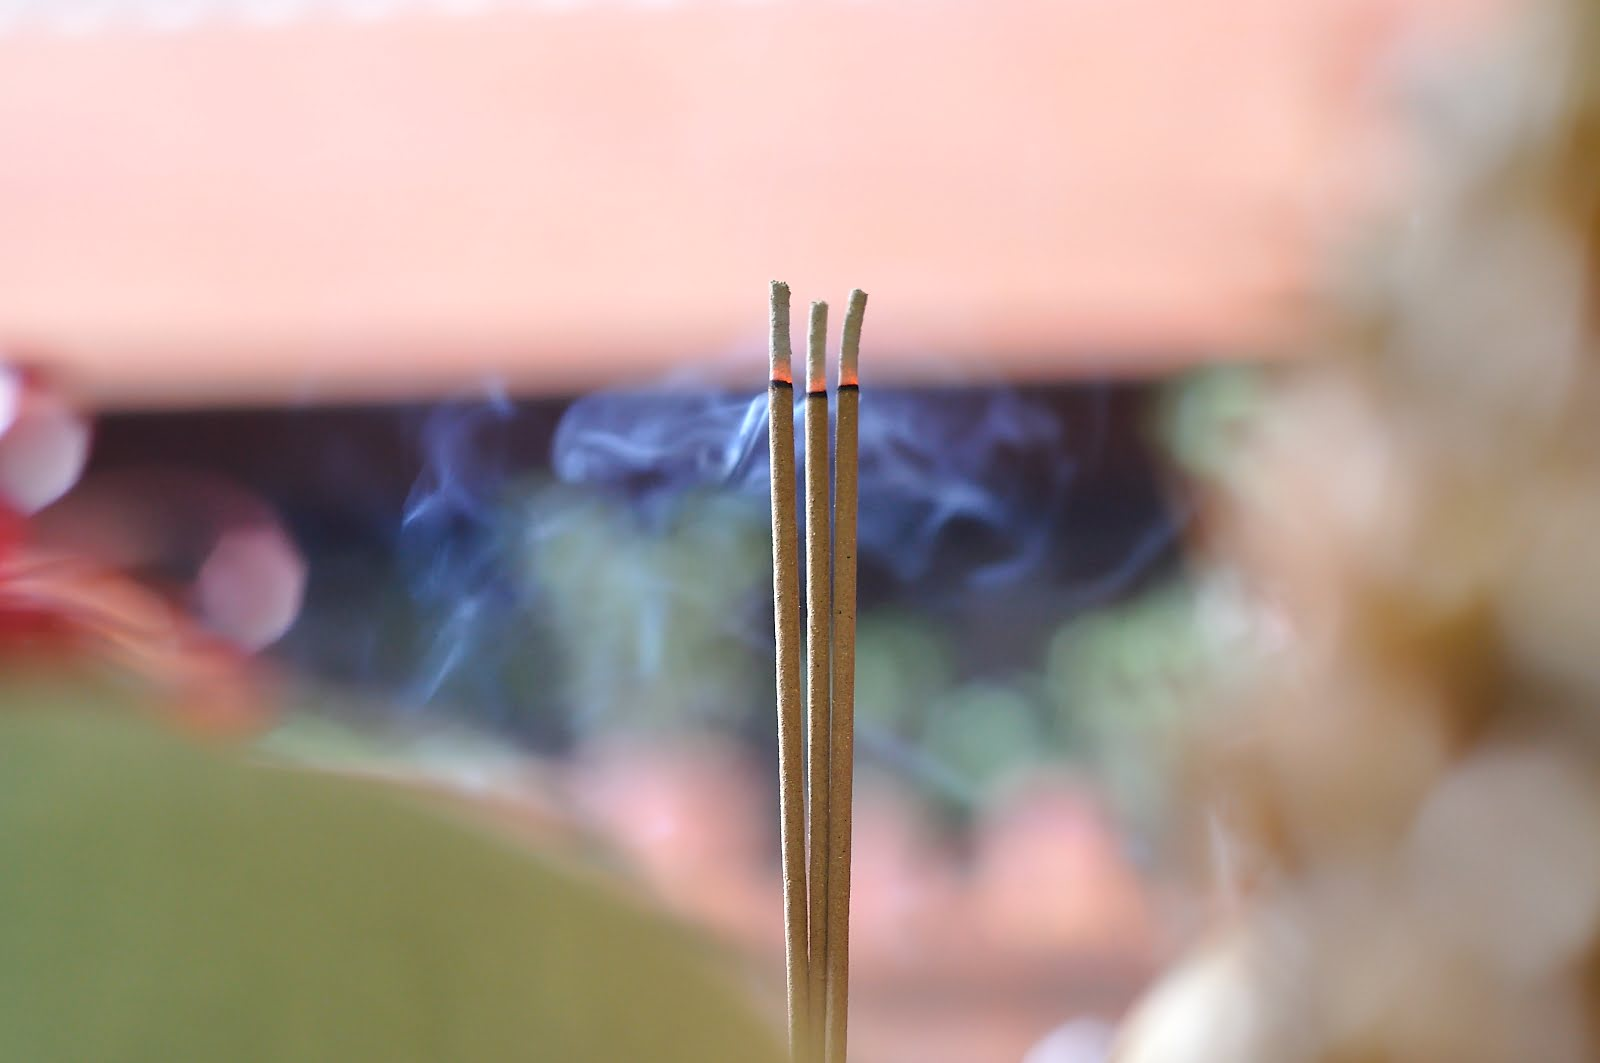 廟宇燒香祈福-Temple-Burn-Incense-Vedfolnir